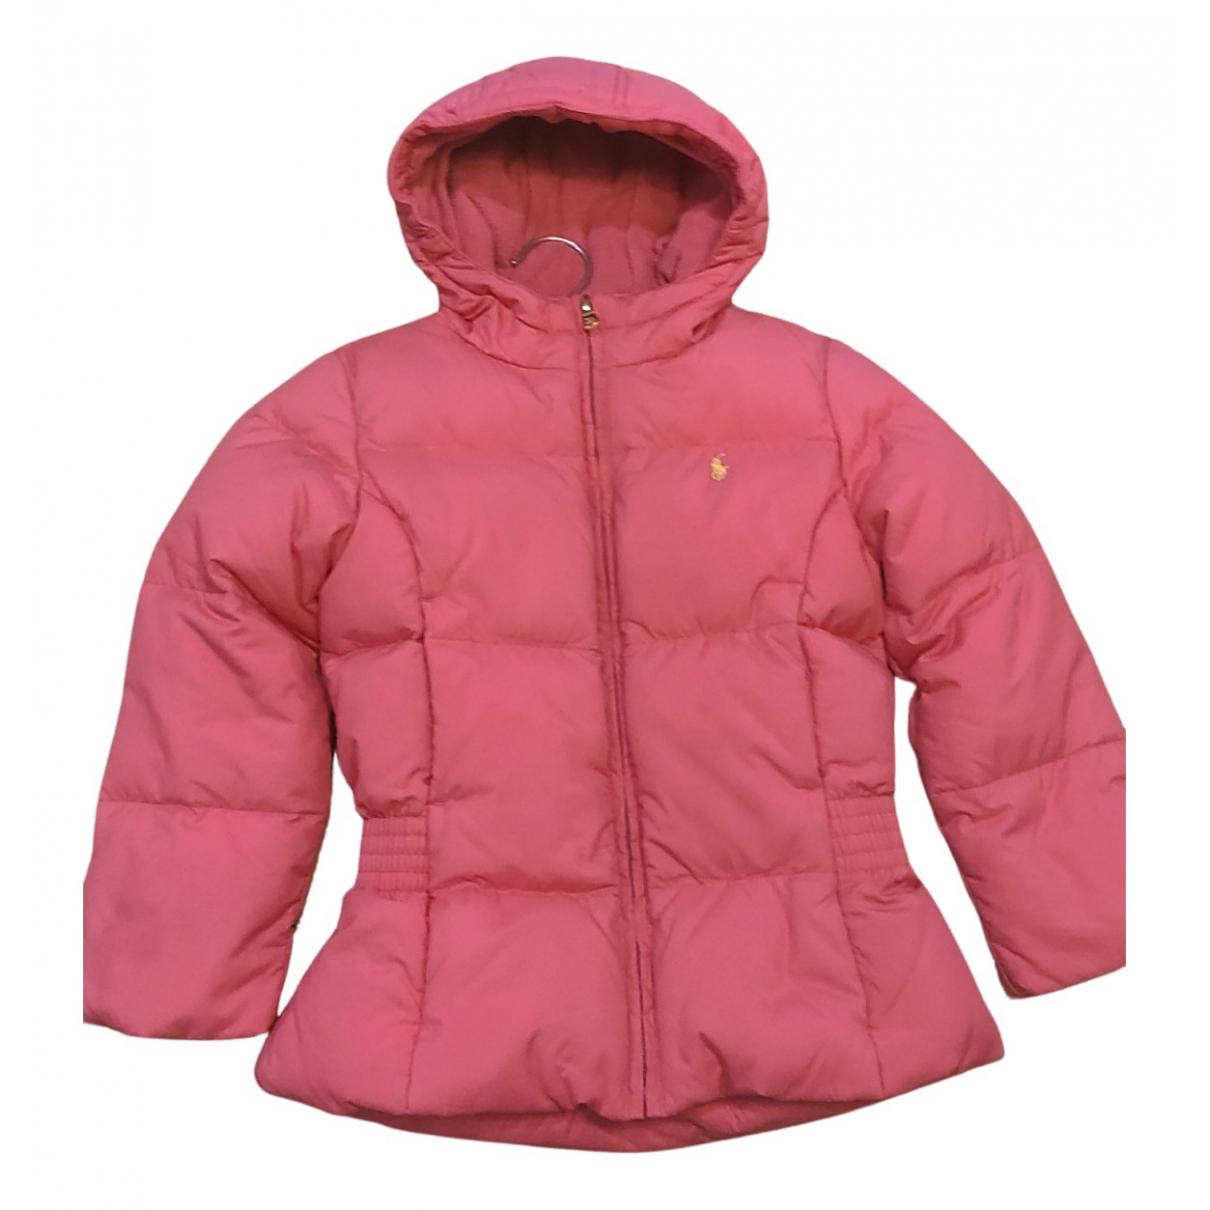 Ralph Lauren N Pink jacket & coat for Kids 5 years - up to 108cm FR